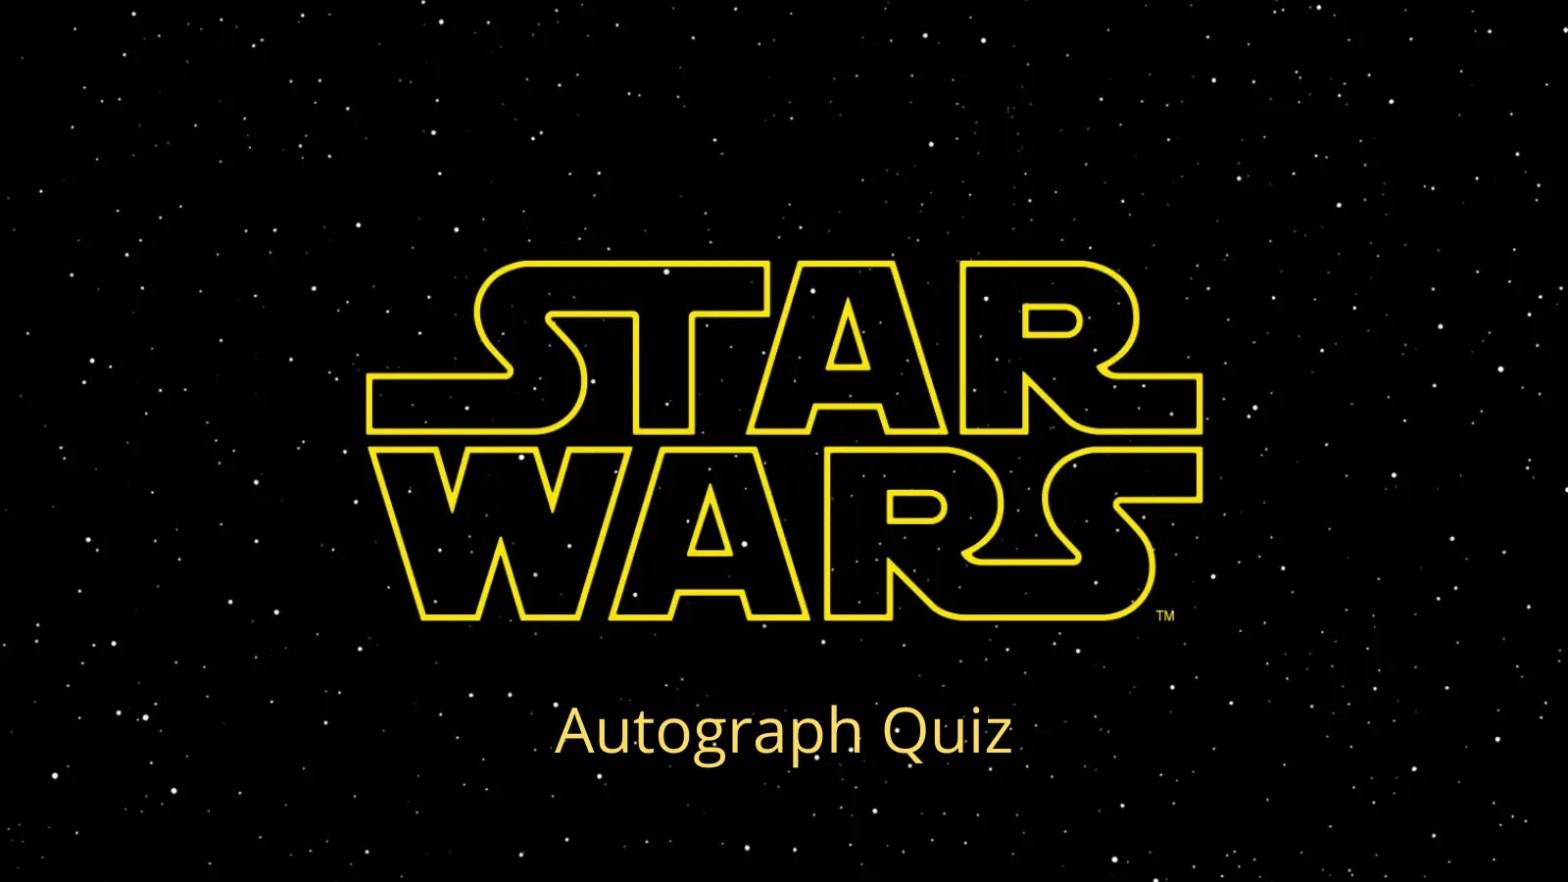 Star Wars Autograph Quiz